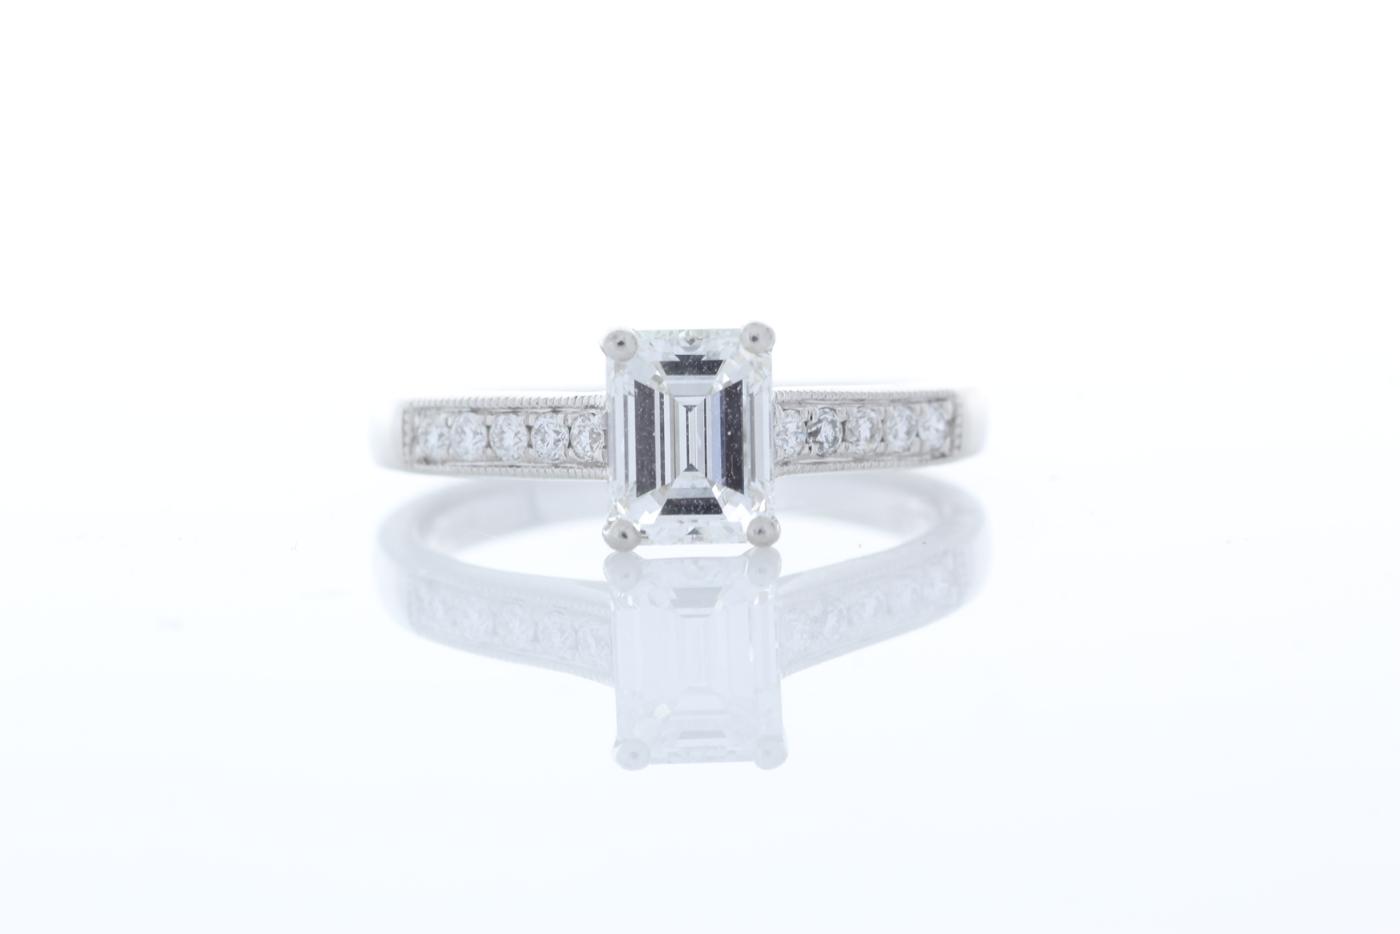 Lot 48 - Platinum Emerald Cut Diamond Ring 1.04 Carats